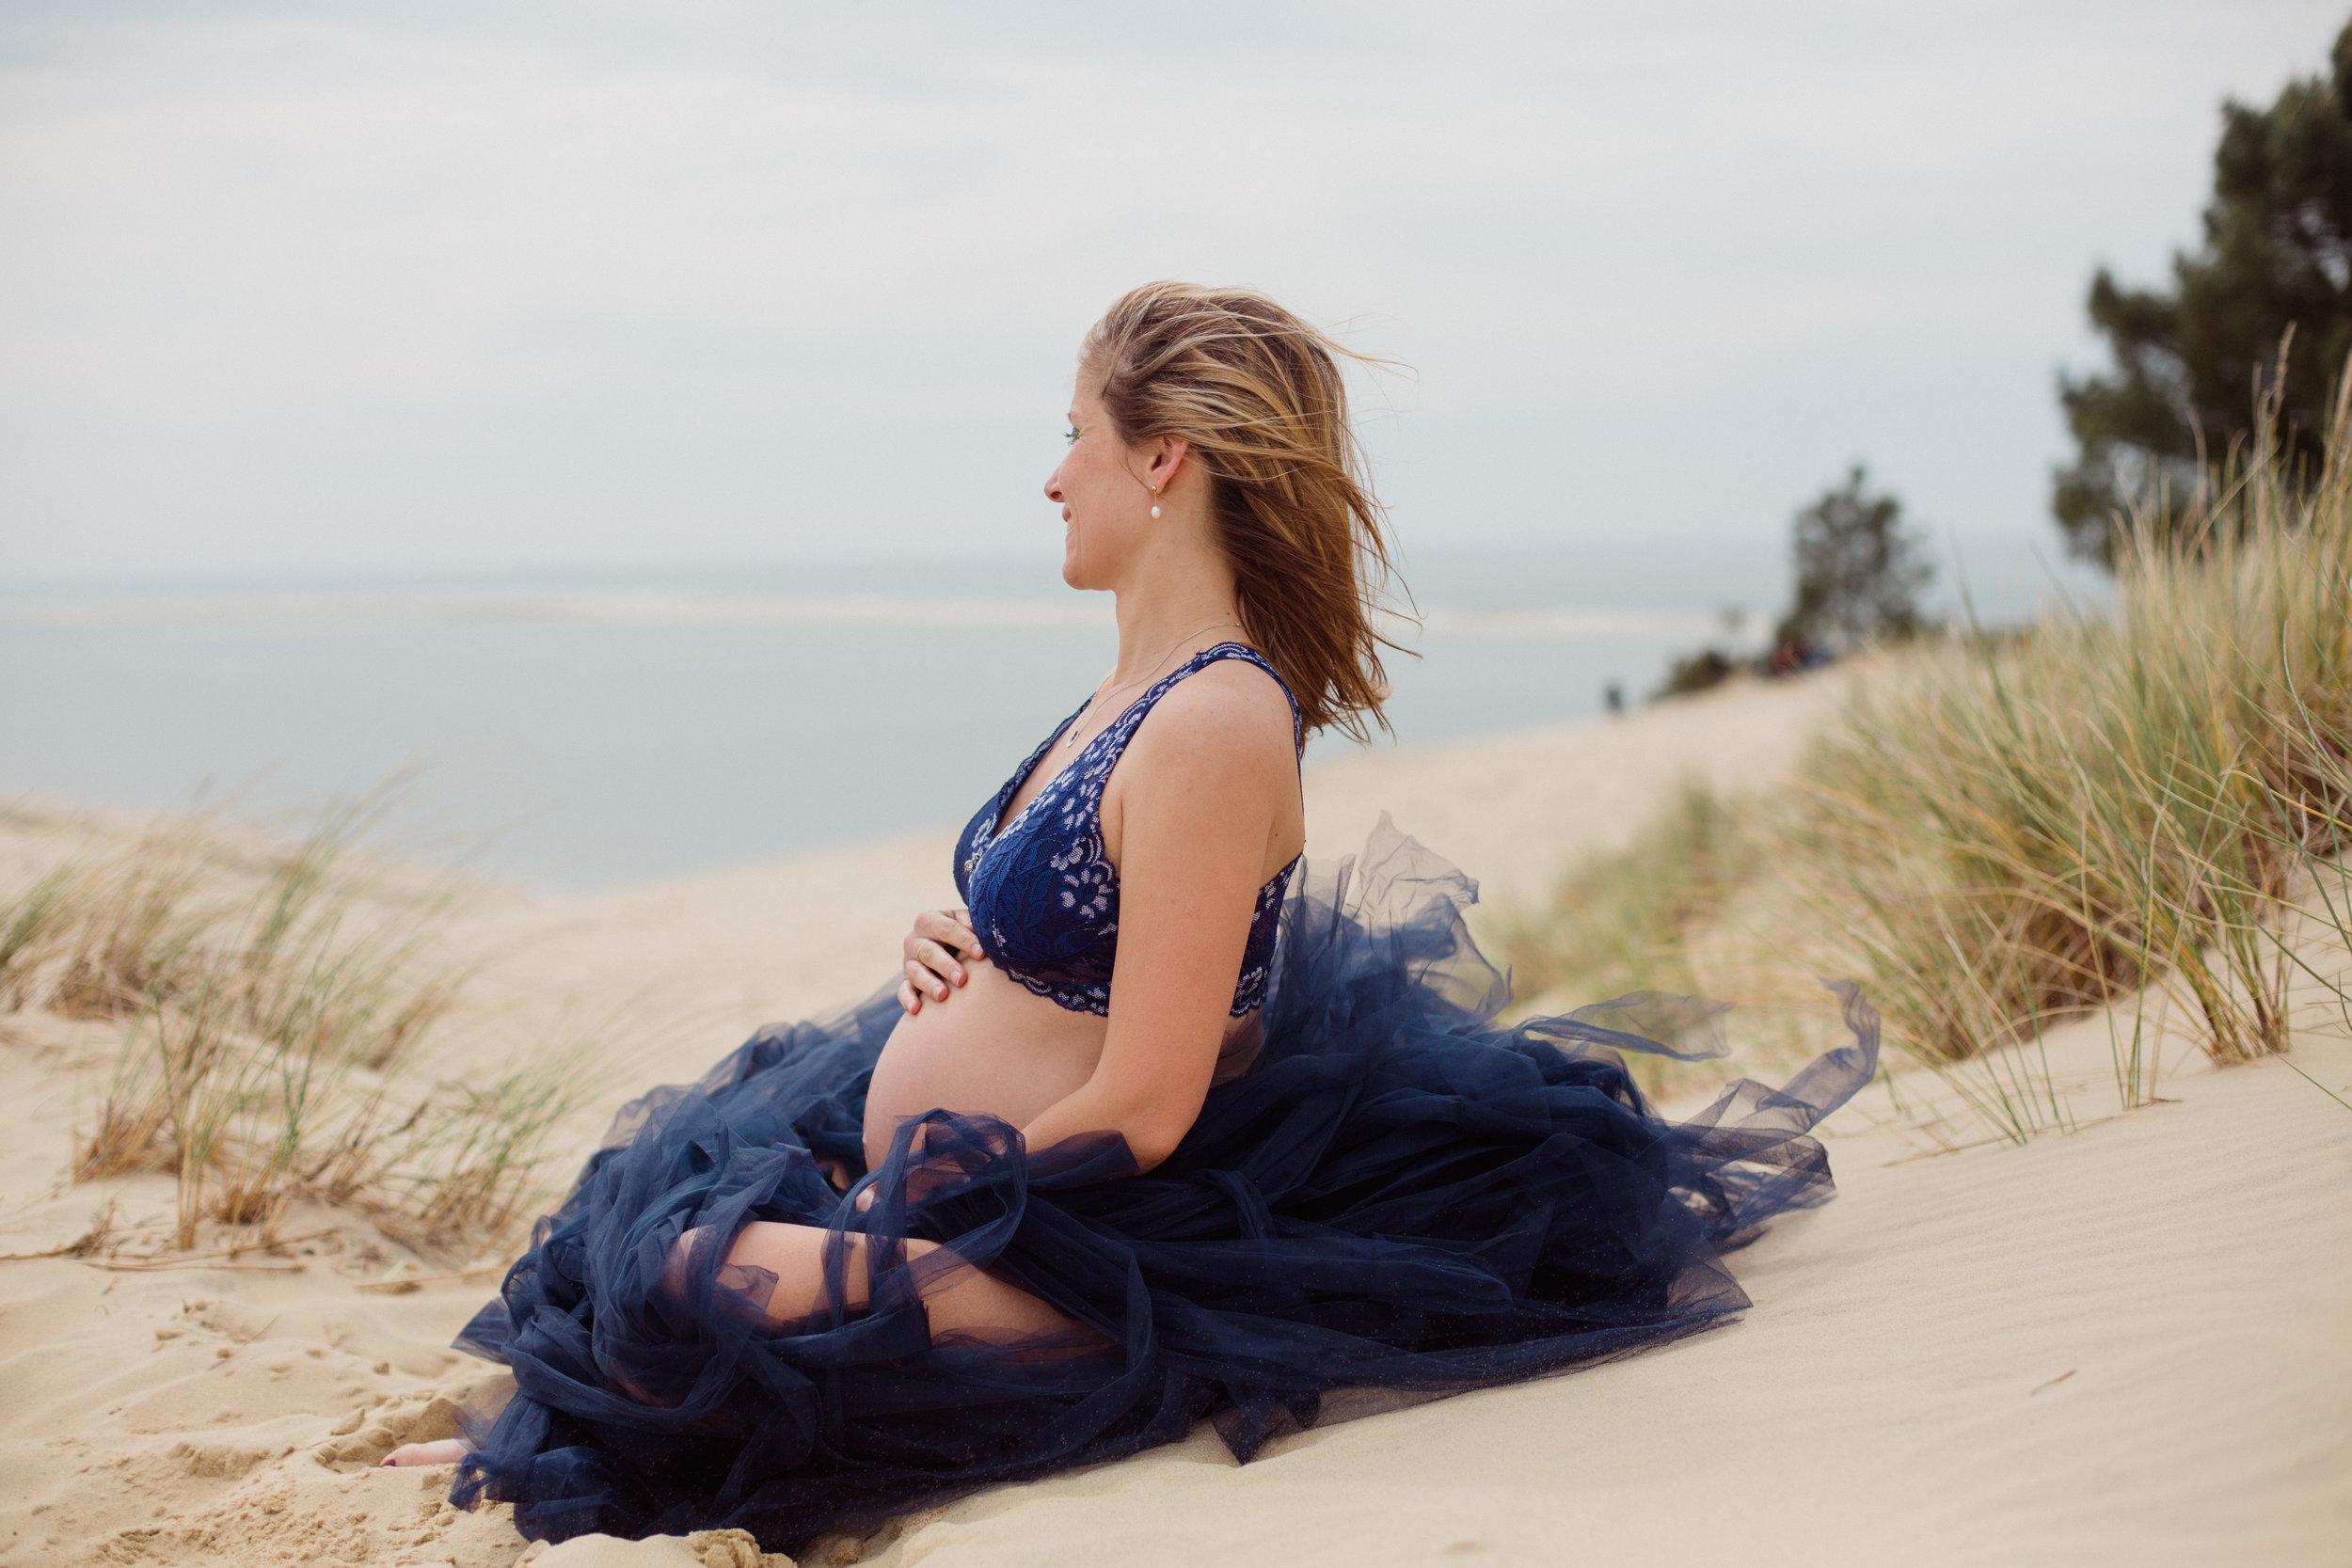 seance-photo-grossesse-ventre-rond-sud-ouest-aquitaine-photographe-pauline-maroussia-p